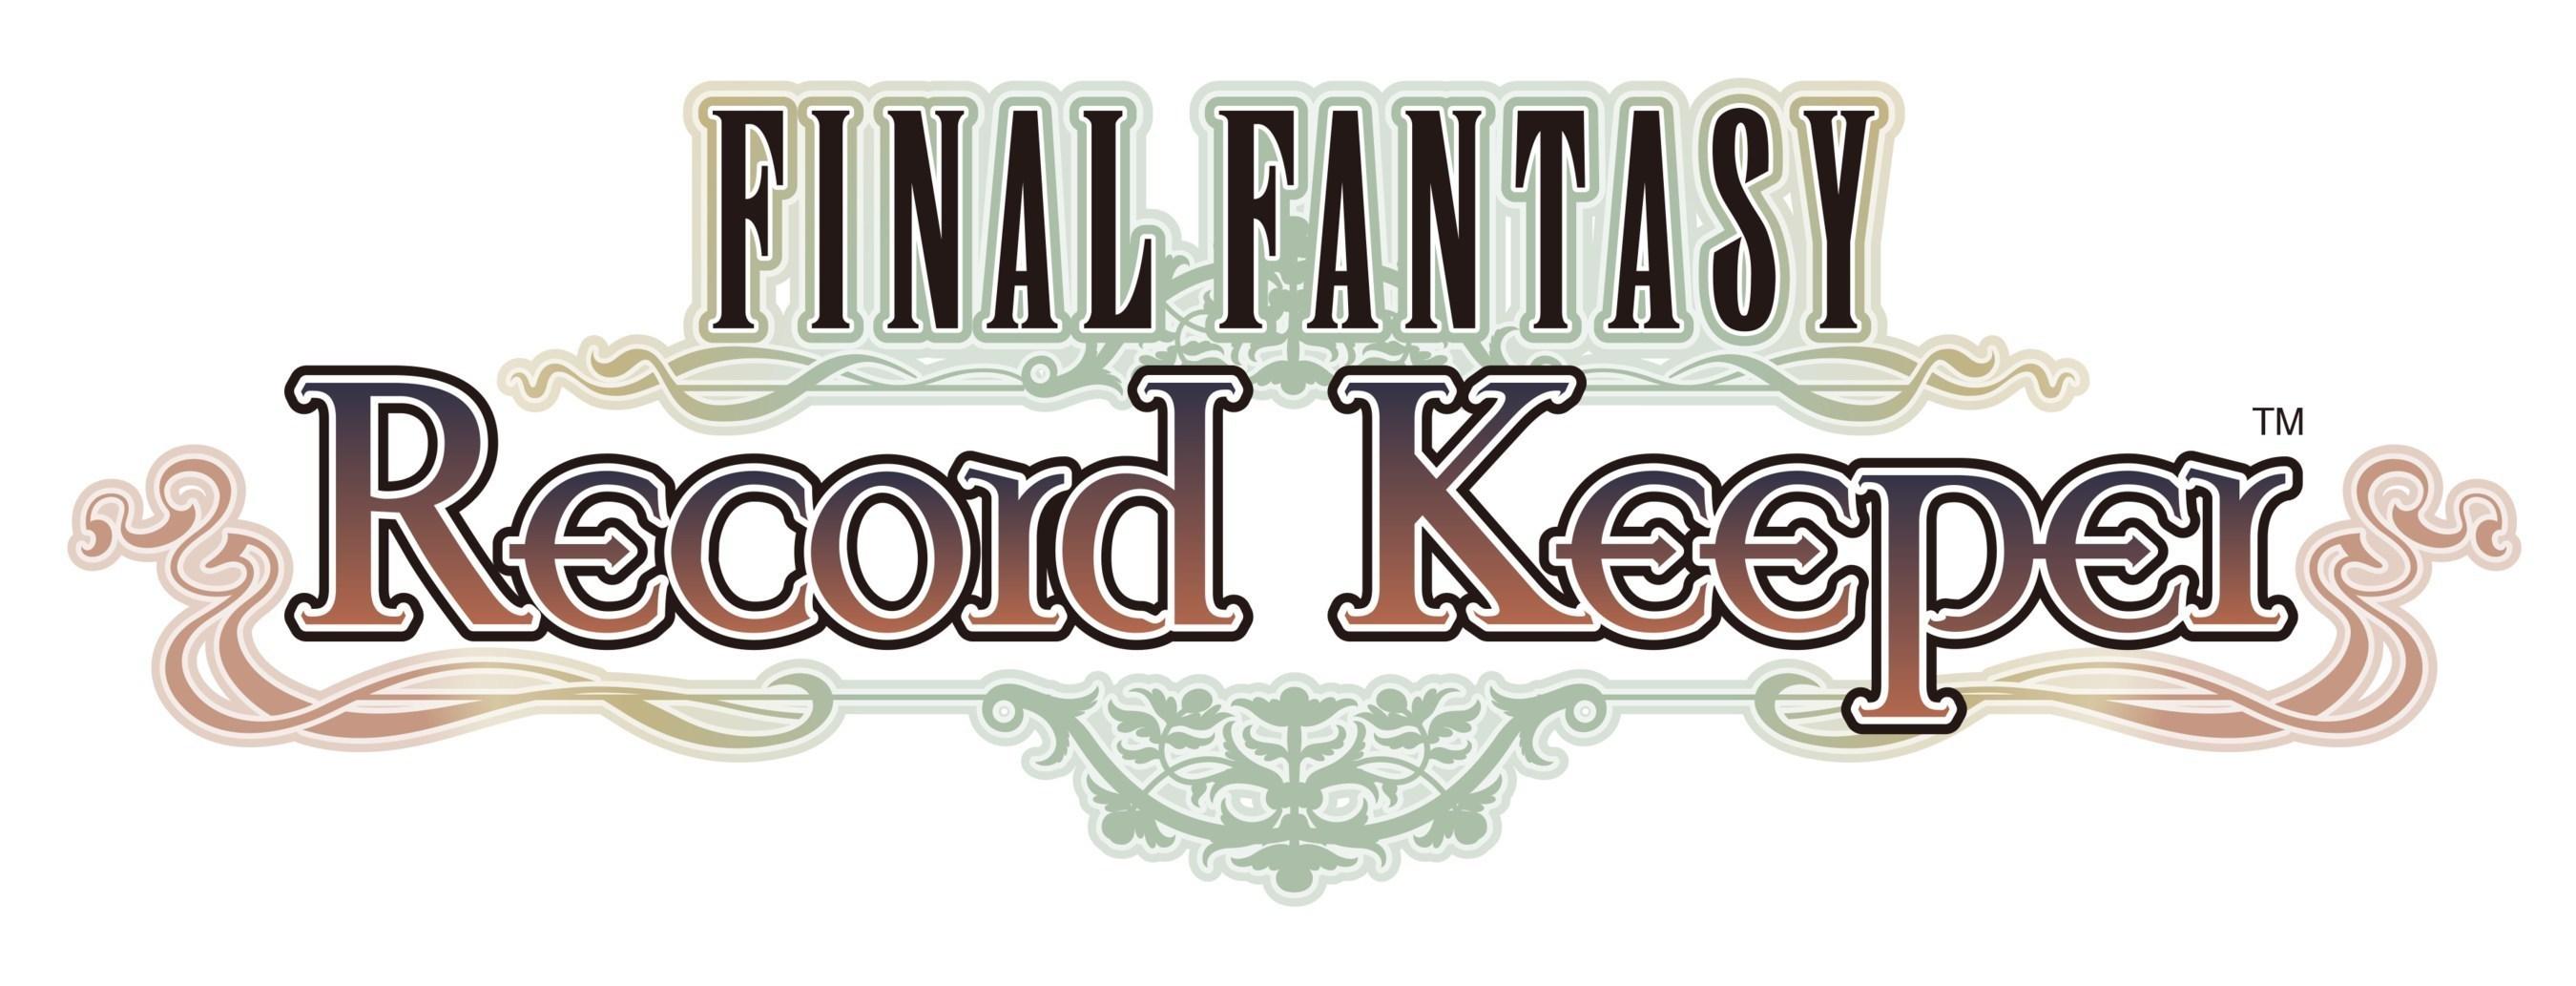 Final Fantasy Record Keeper logo